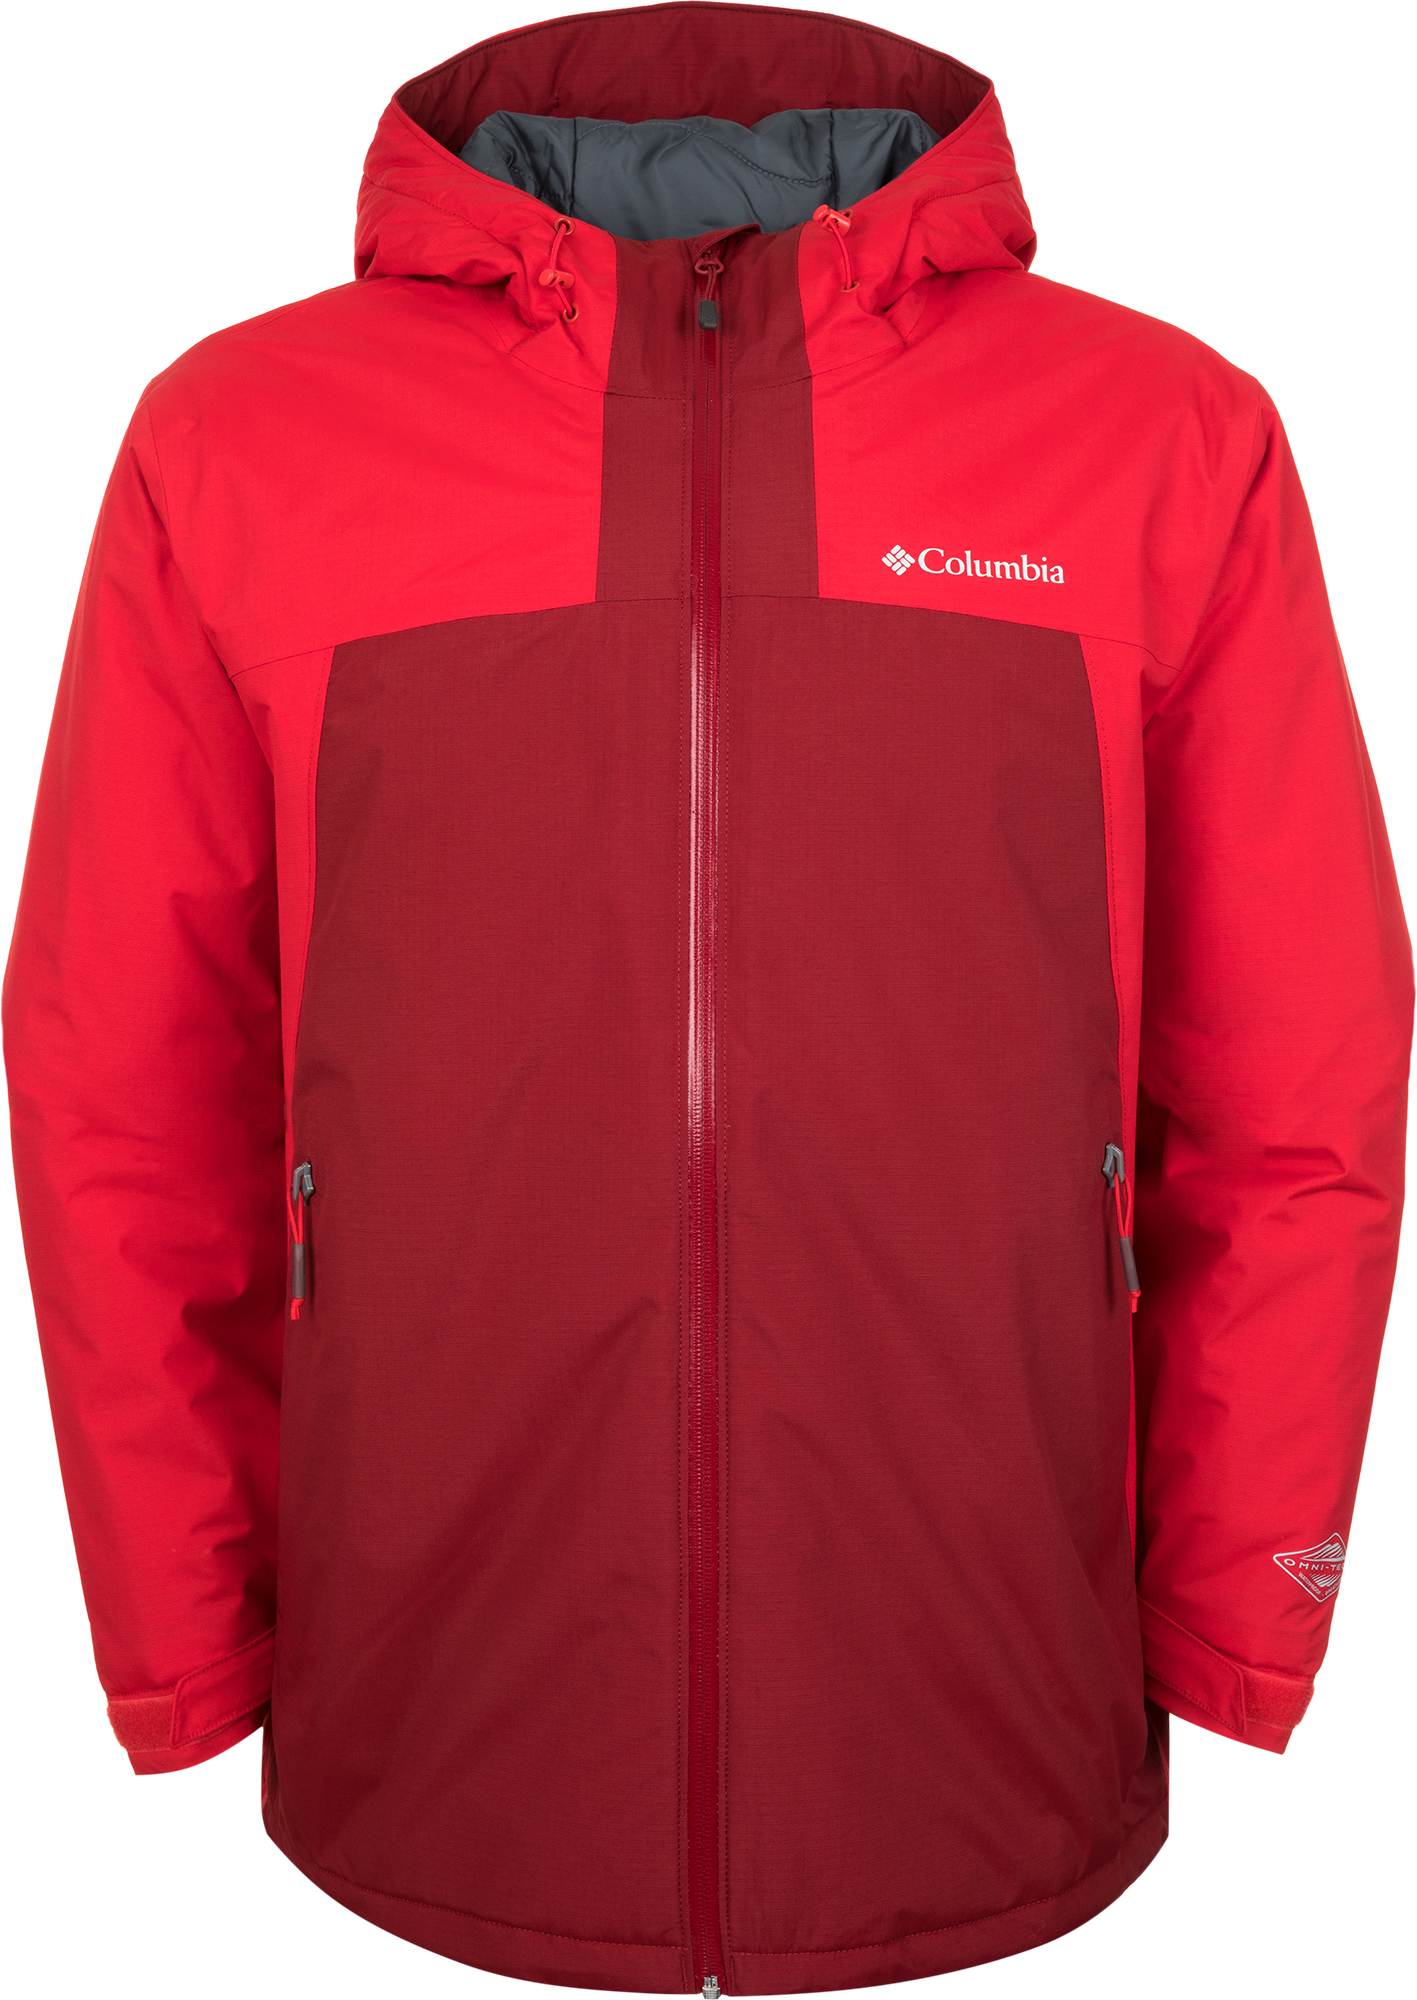 Columbia Куртка утепленная мужская Columbia Sprague Mountain, размер 52-54